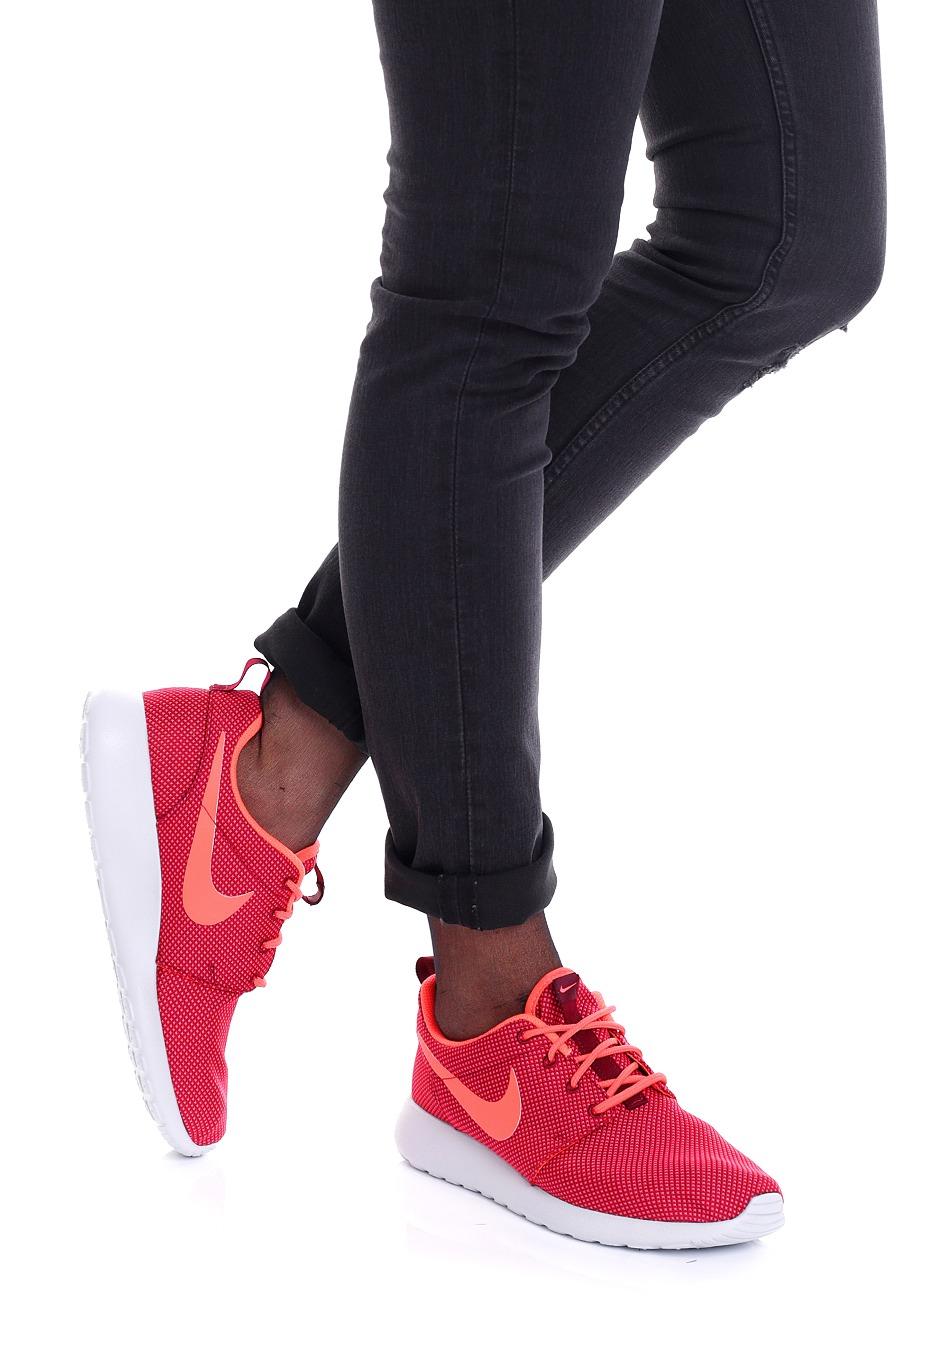 f96a075b5837 ... Nike - Roshe One Deep Garnet Bright Crimson Pure Platinum - Girl Shoes